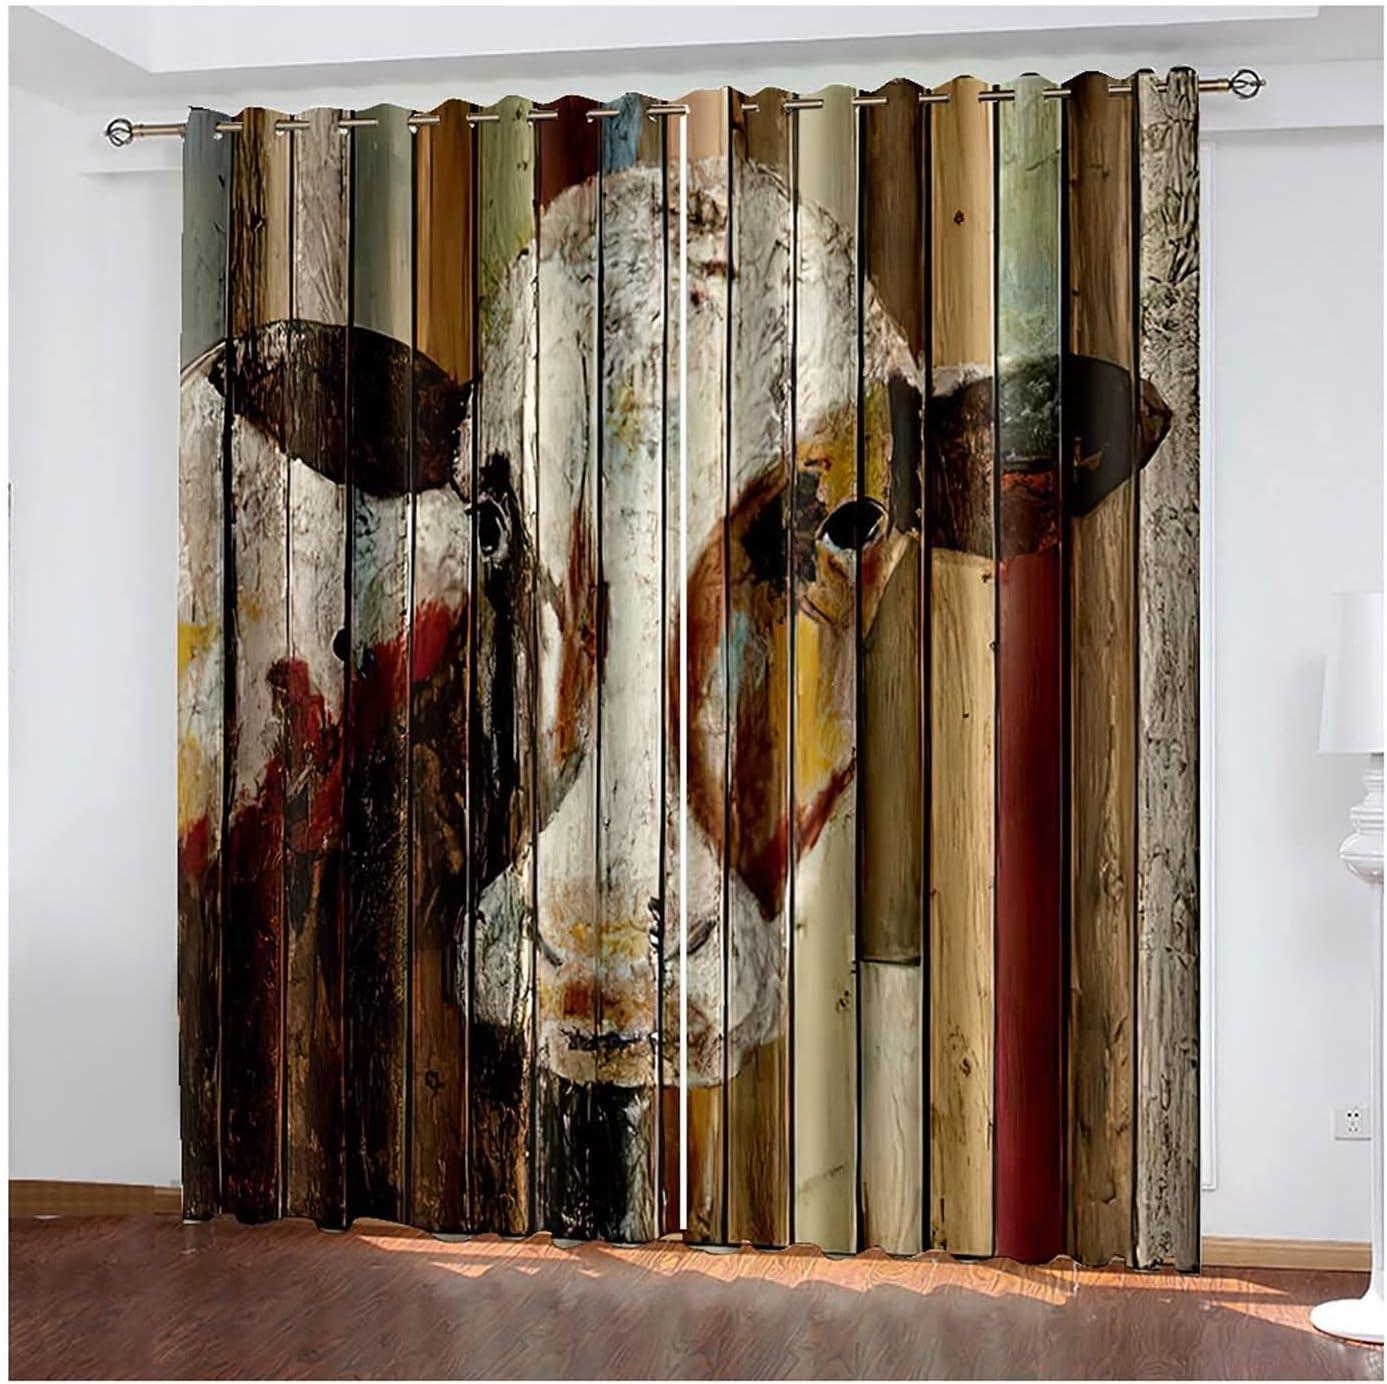 Curtains 2 Panels Blackout for Award-winning store Design Cow Patt Bedroom Popularity